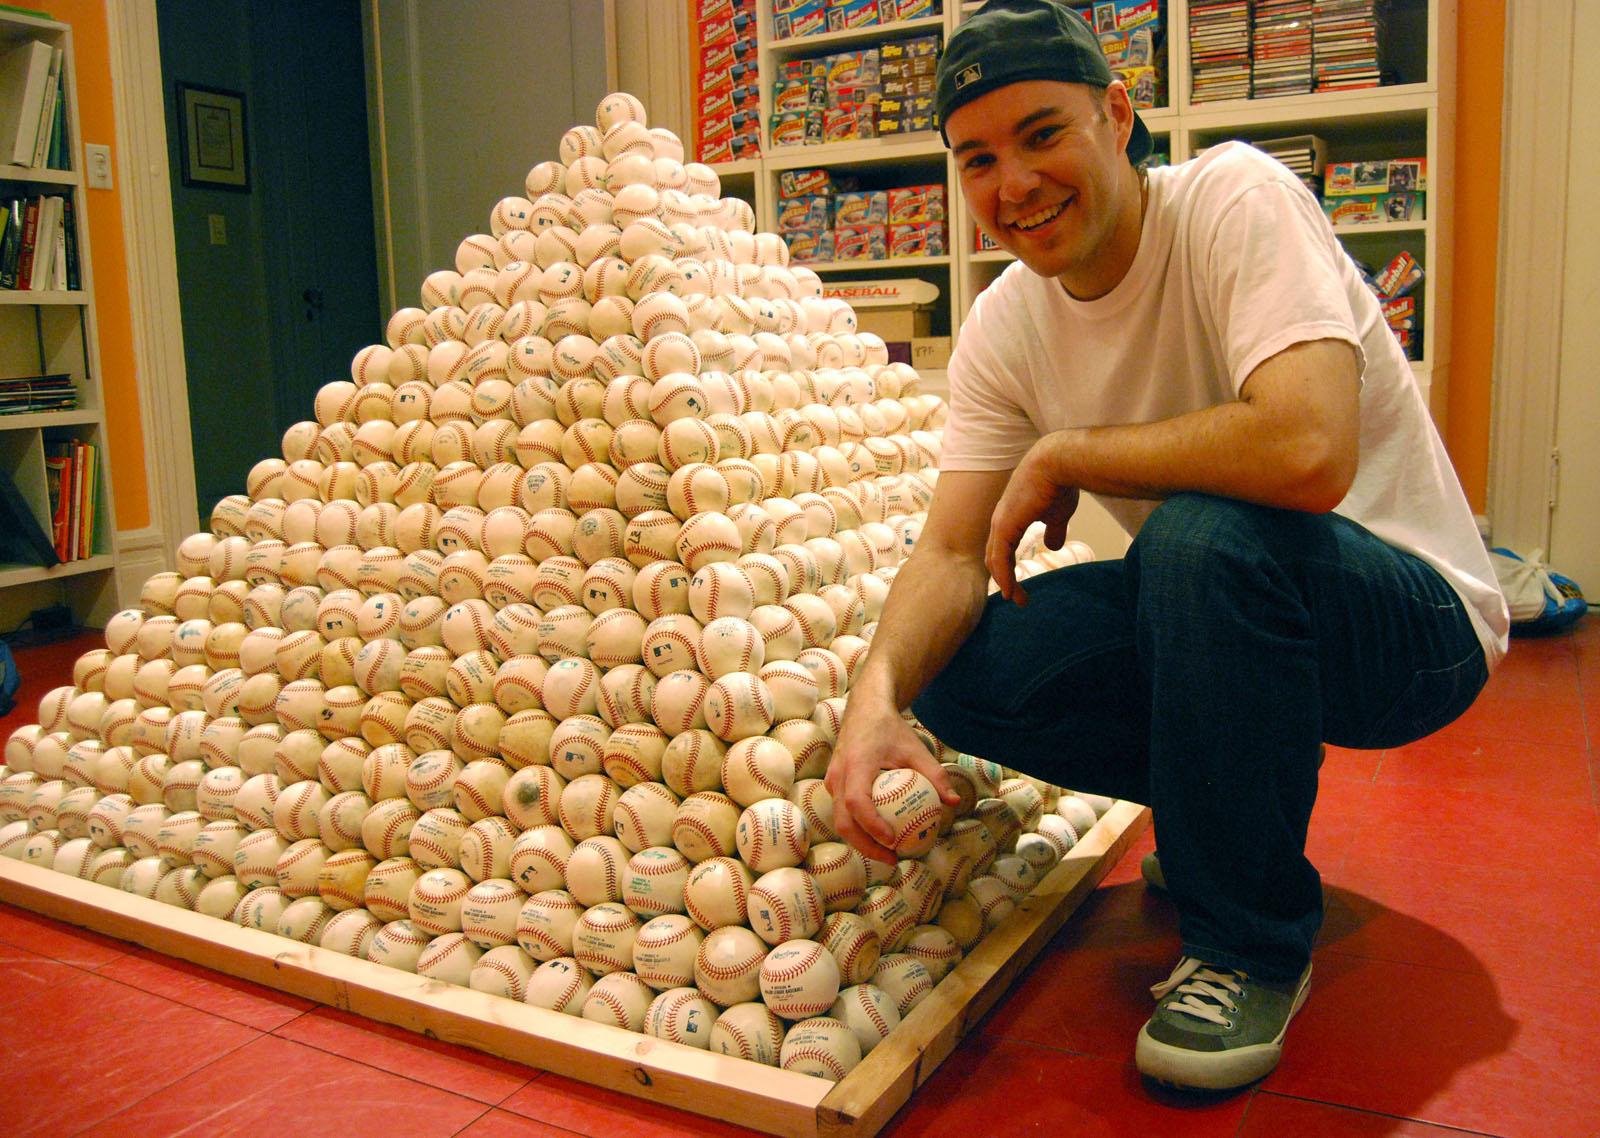 https://i1.wp.com/upload.wikimedia.org/wikipedia/commons/f/f5/Zack_Hample_posing_with_a_pyramid_of_baseballs.jpg